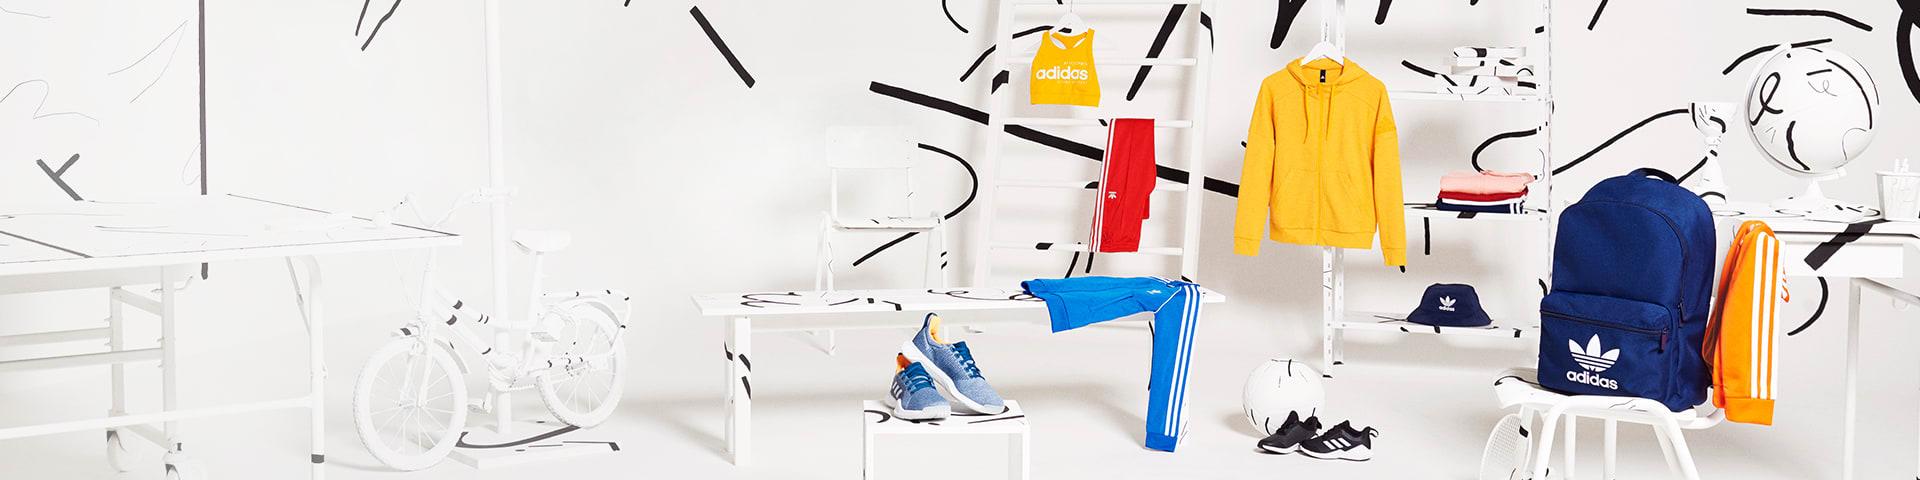 Ofertas en moda deportiva masculina   Outlet online en adidas